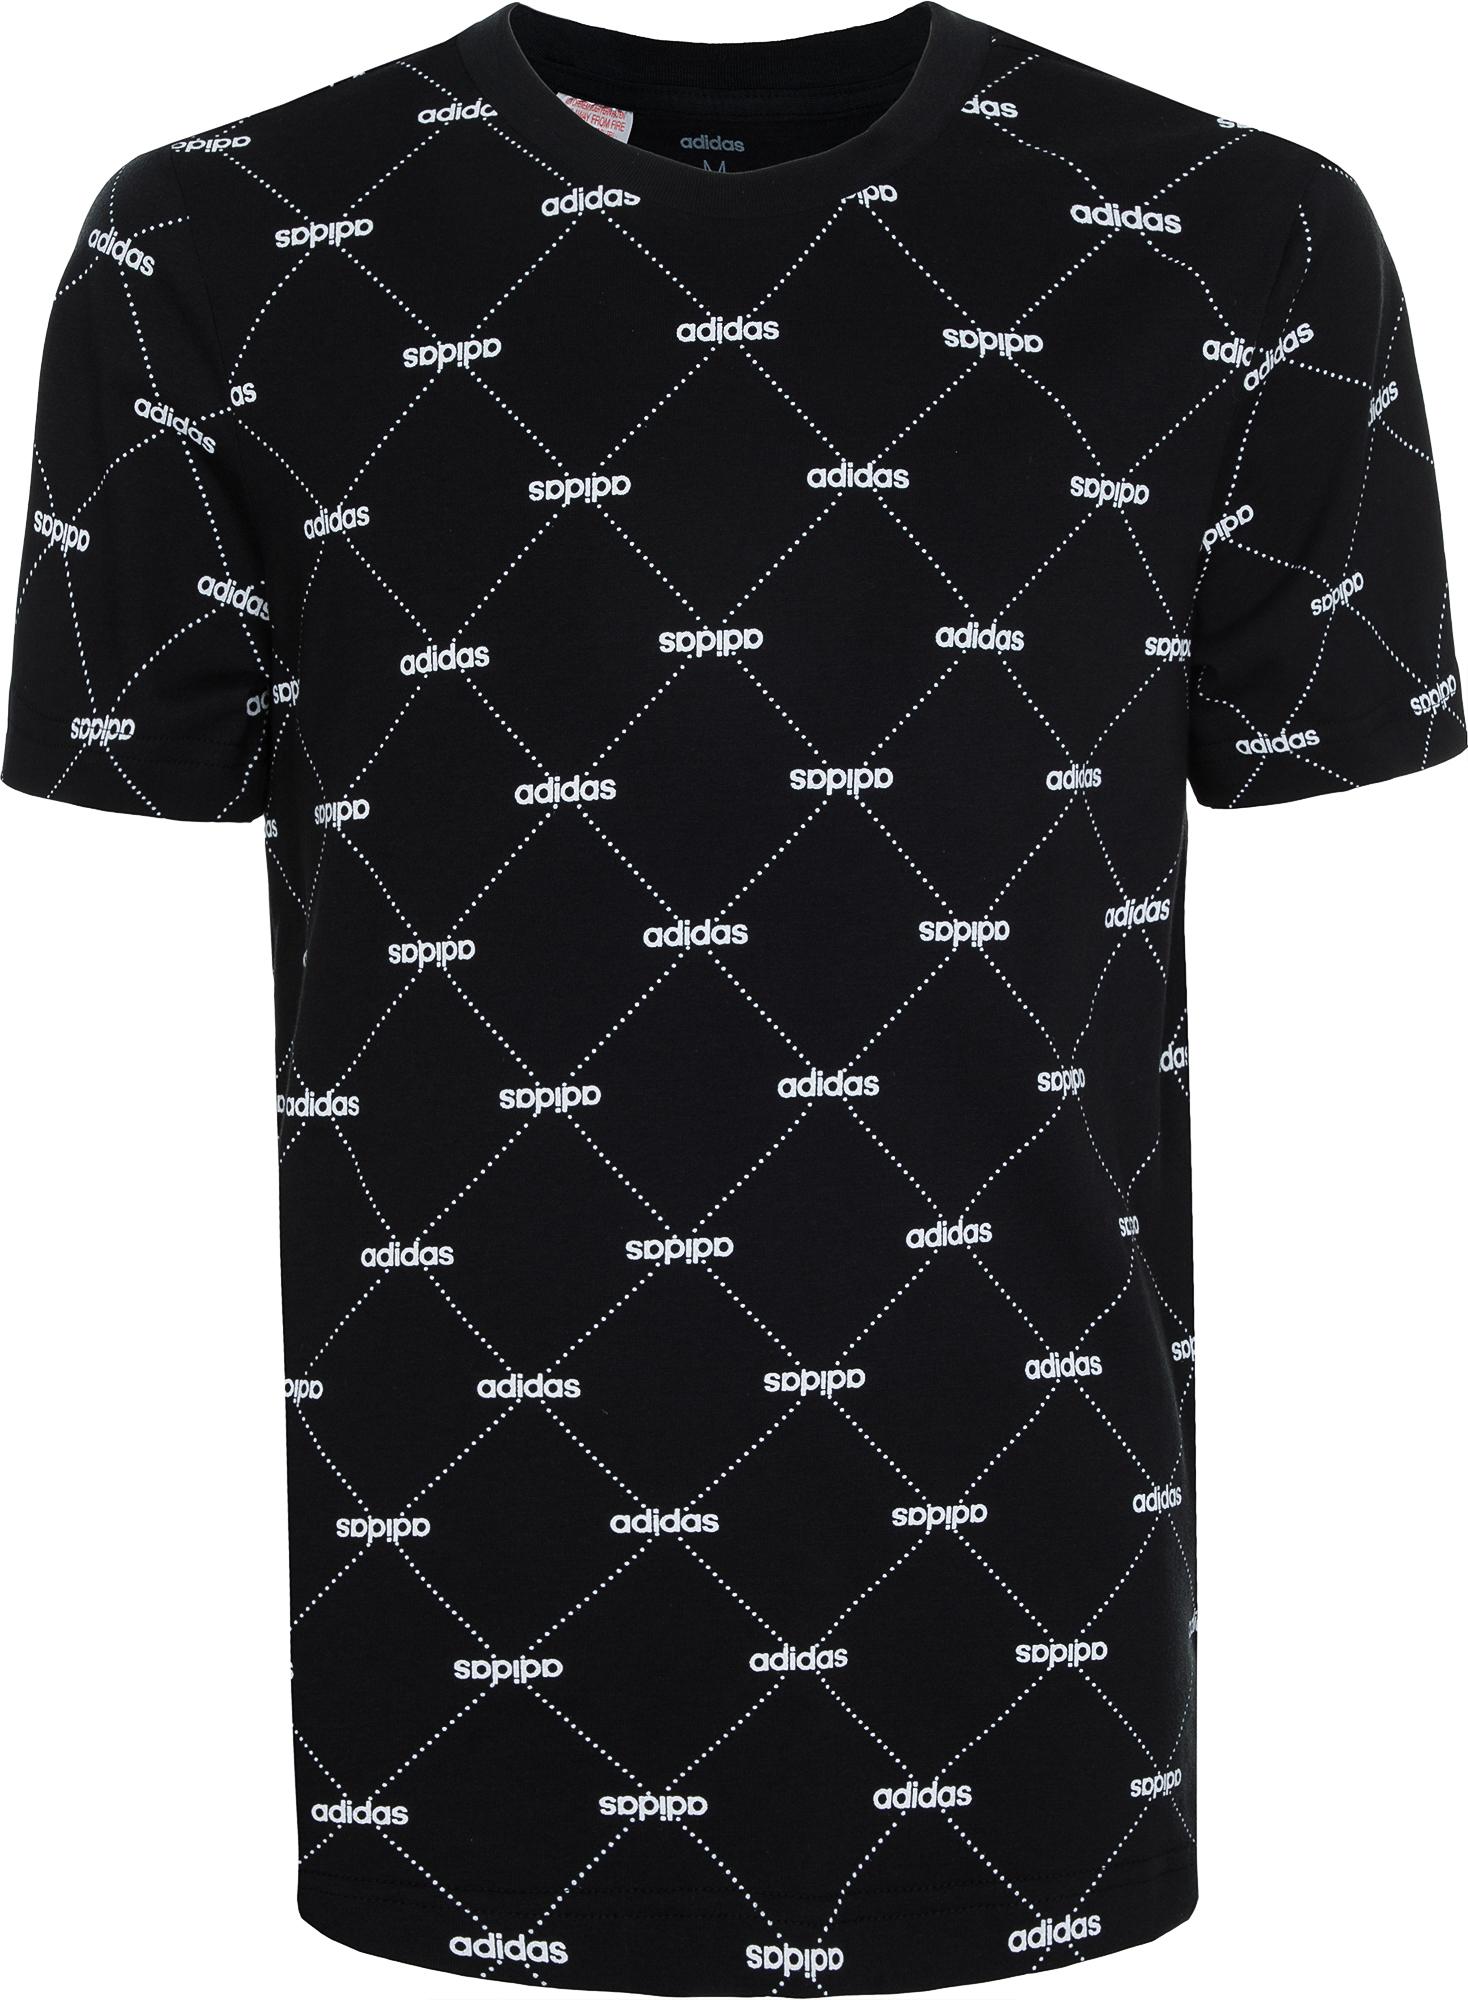 Adidas Футболка для мальчиков Adidas, размер 140